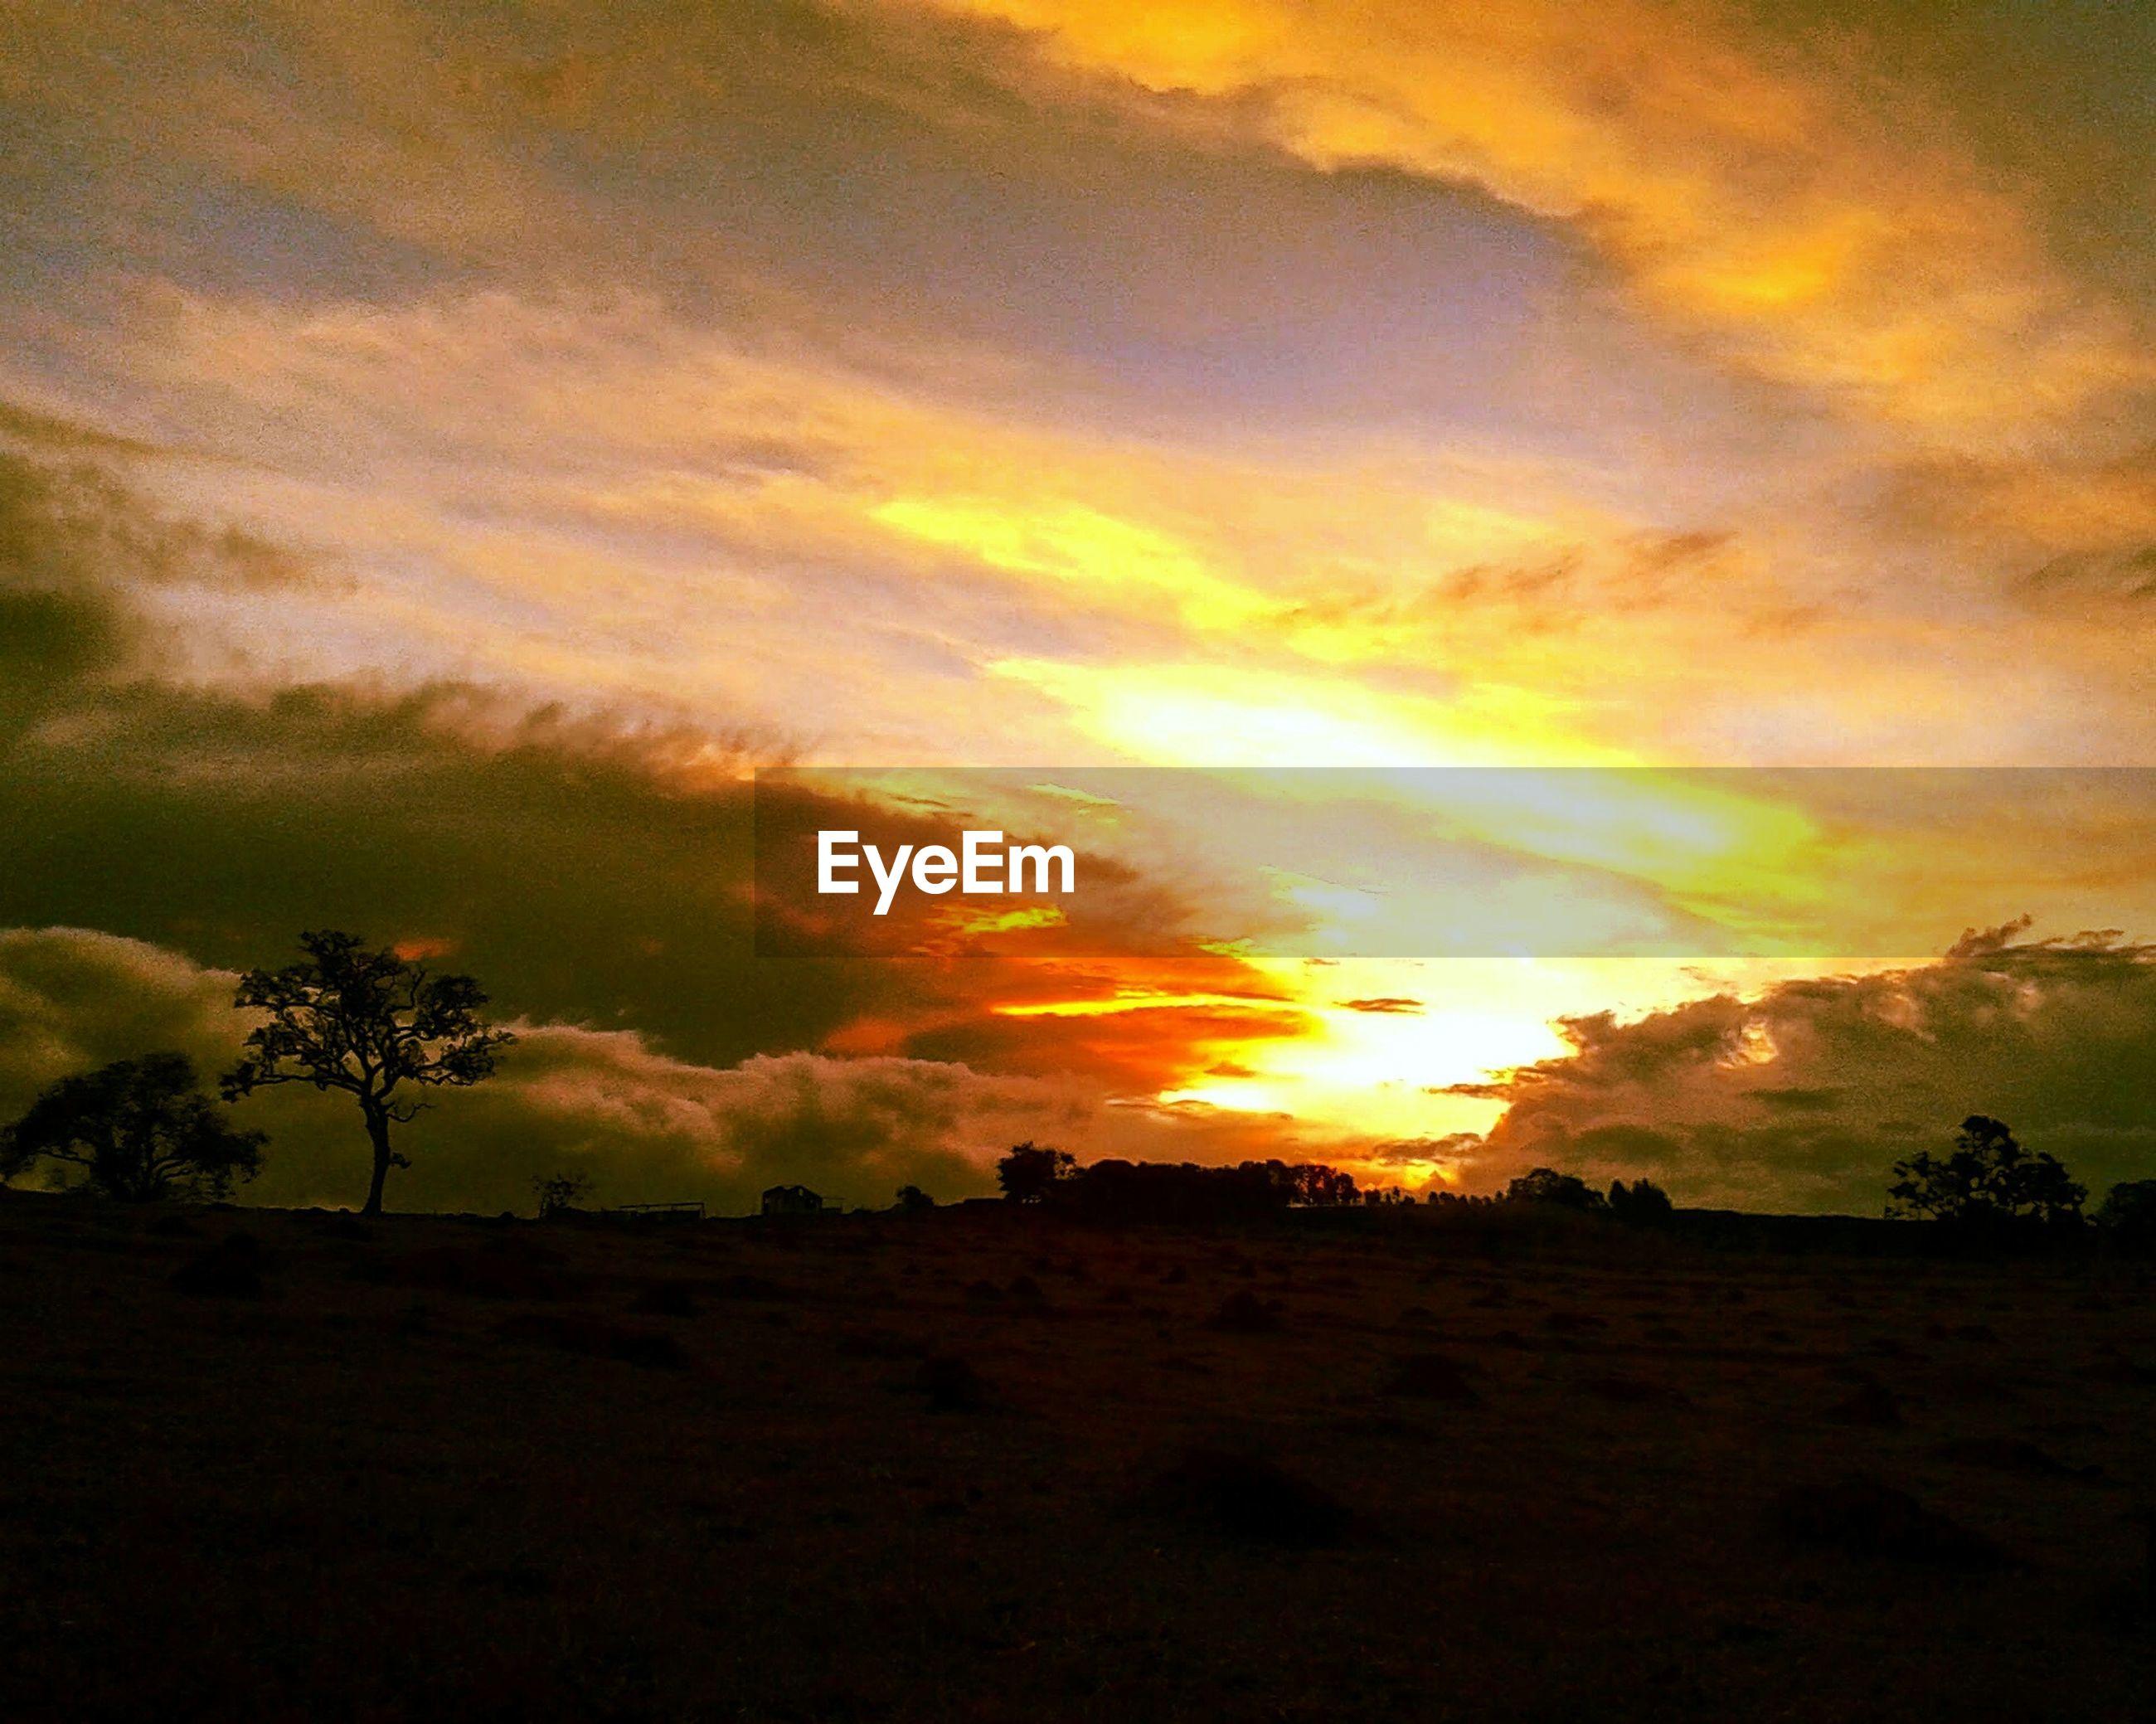 sunset, sky, tranquil scene, scenics, tranquility, silhouette, beauty in nature, cloud - sky, landscape, orange color, nature, idyllic, dramatic sky, cloud, cloudy, field, tree, outdoors, sun, moody sky